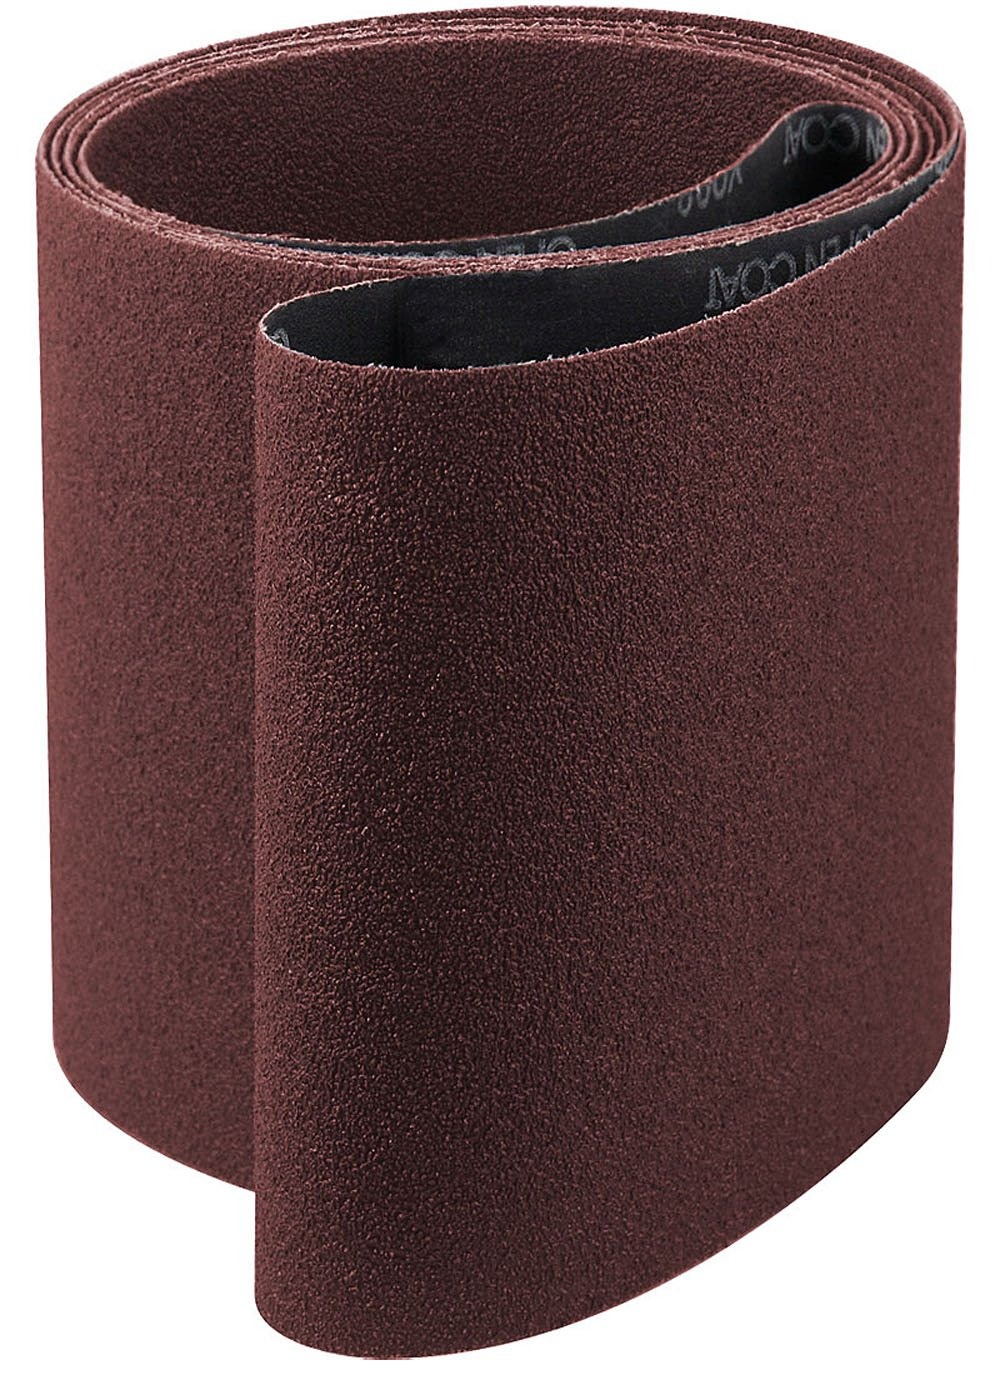 6x80 Aluminum Oxide 100 Grit Sander Belt, x-weight<br>A&H Abrasives 933027x10, 10-pack